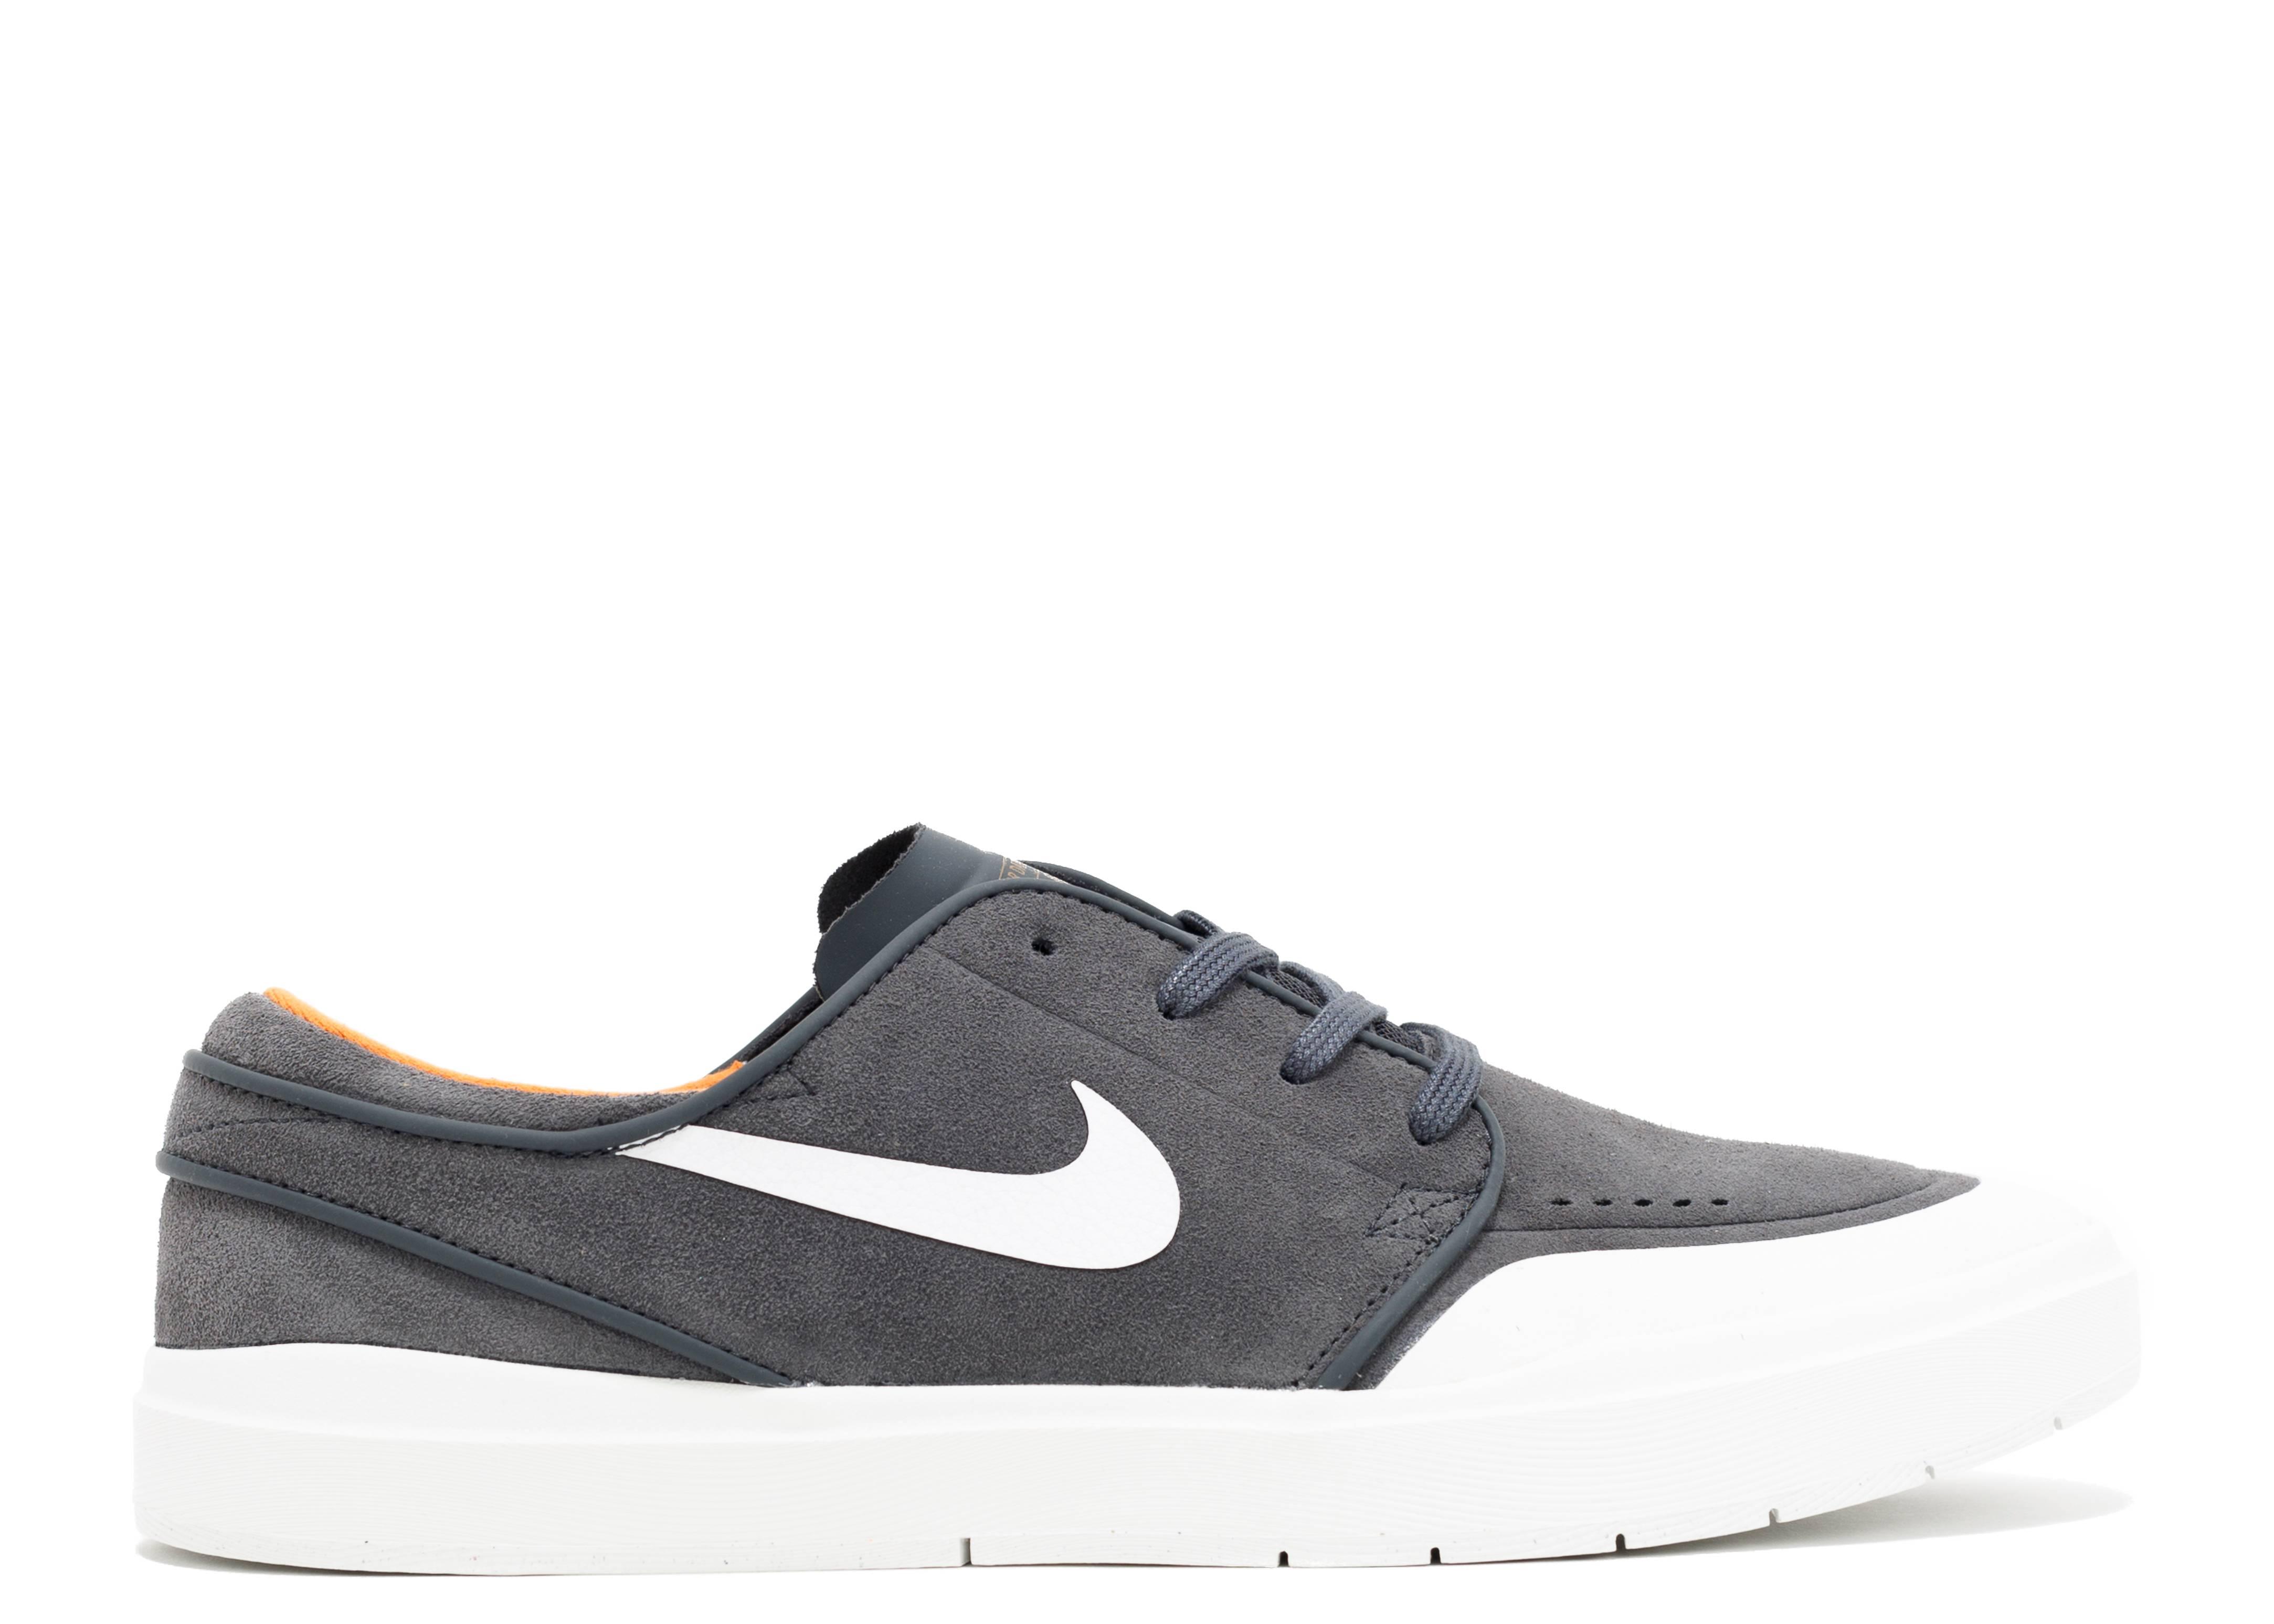 Janoski Hyperfeel Nike Stefan Des Summit Musée Sb White qtwE4wA